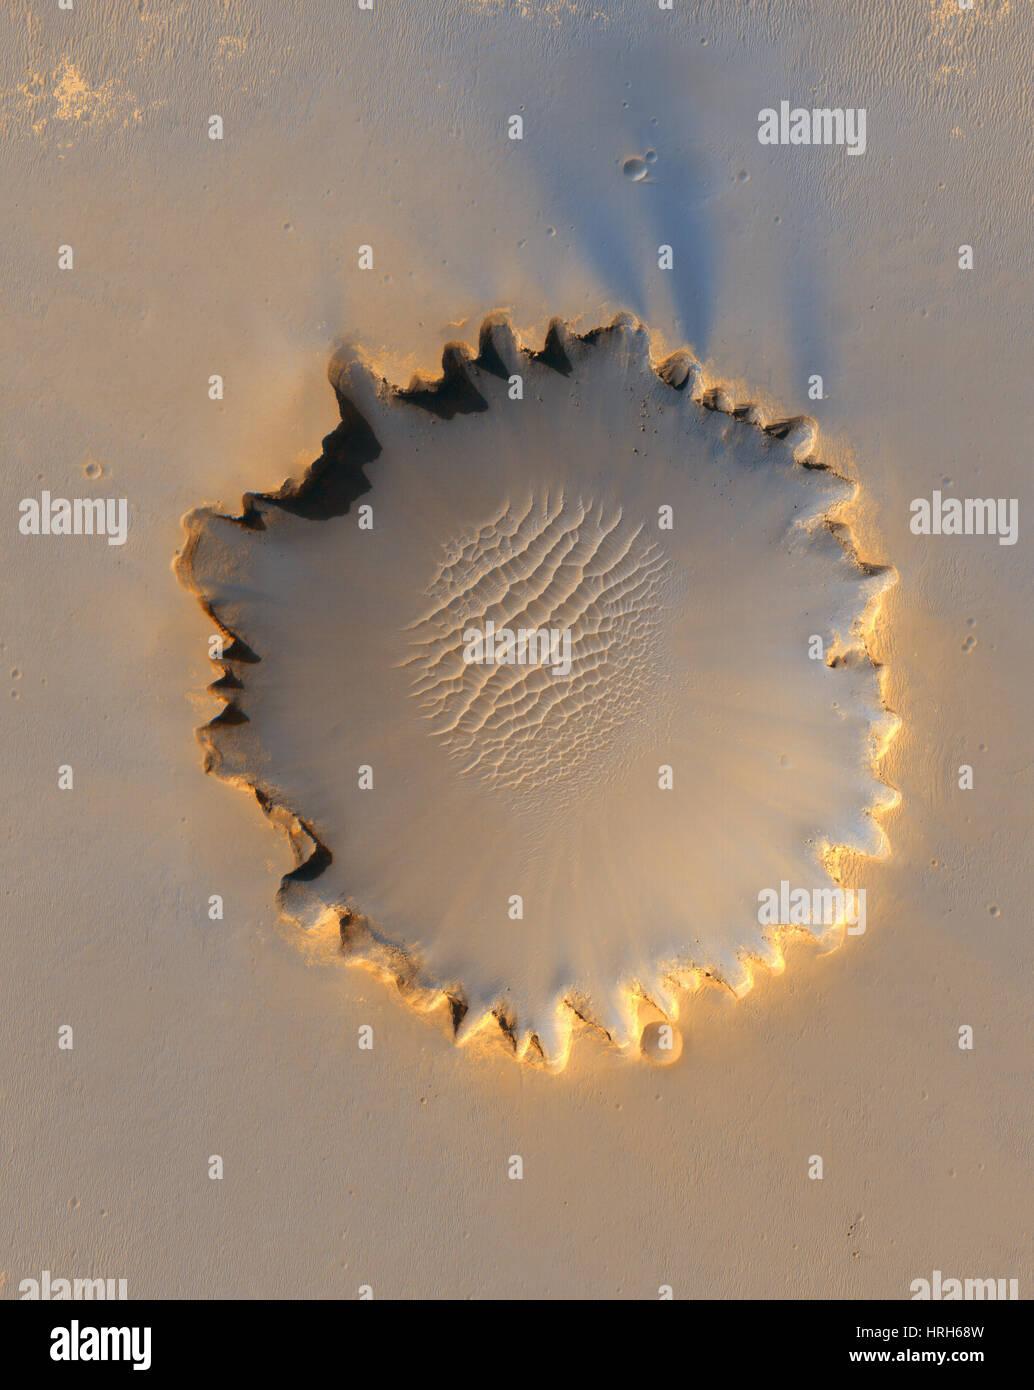 Victoria Crater, Mars - Stock Image